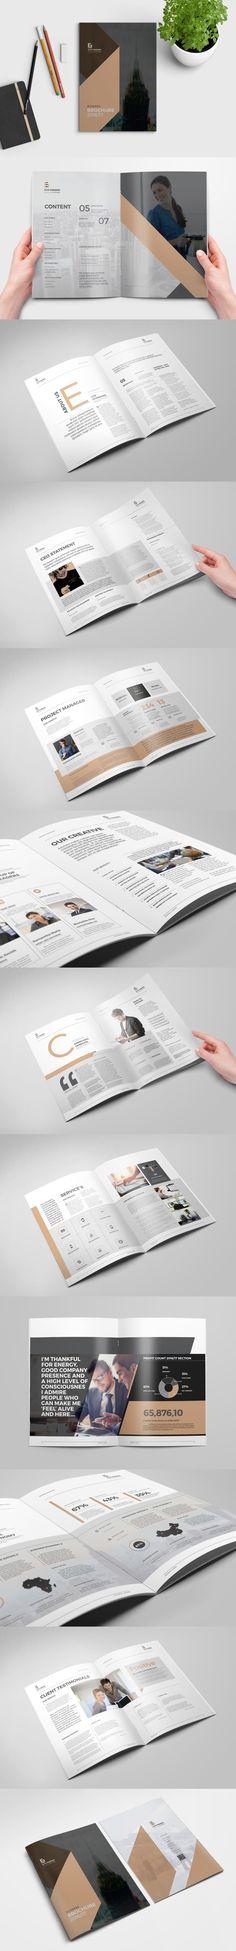 8 Best Brochures Images On Pinterest In 2018 Business Brochure